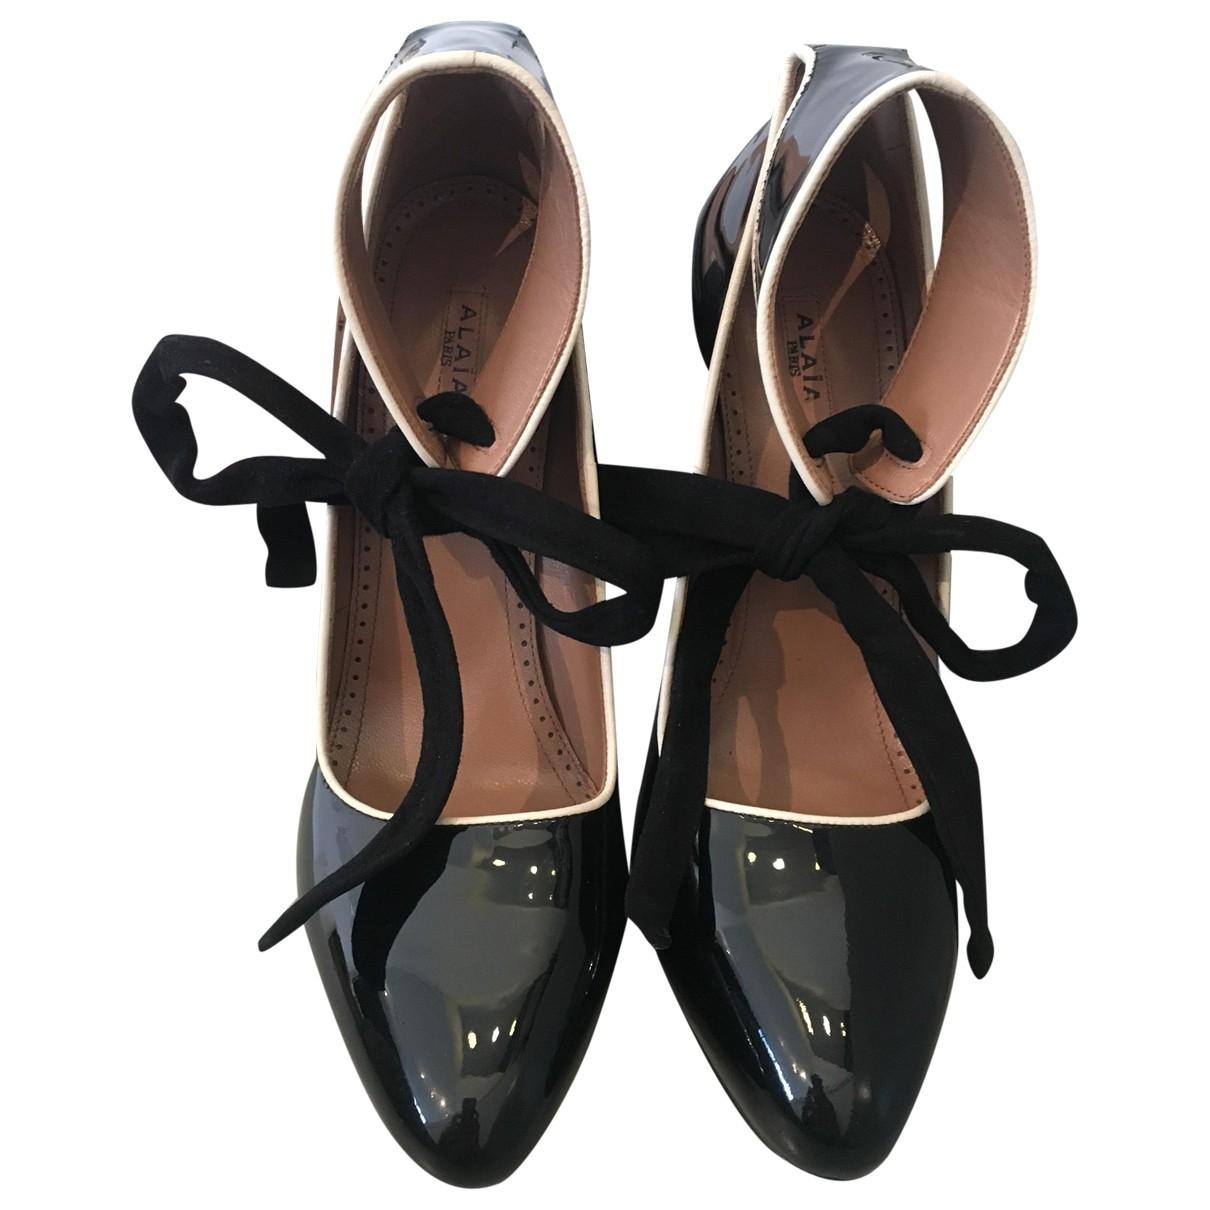 Alaïa \N Black Patent leather Heels for Women 39 EU